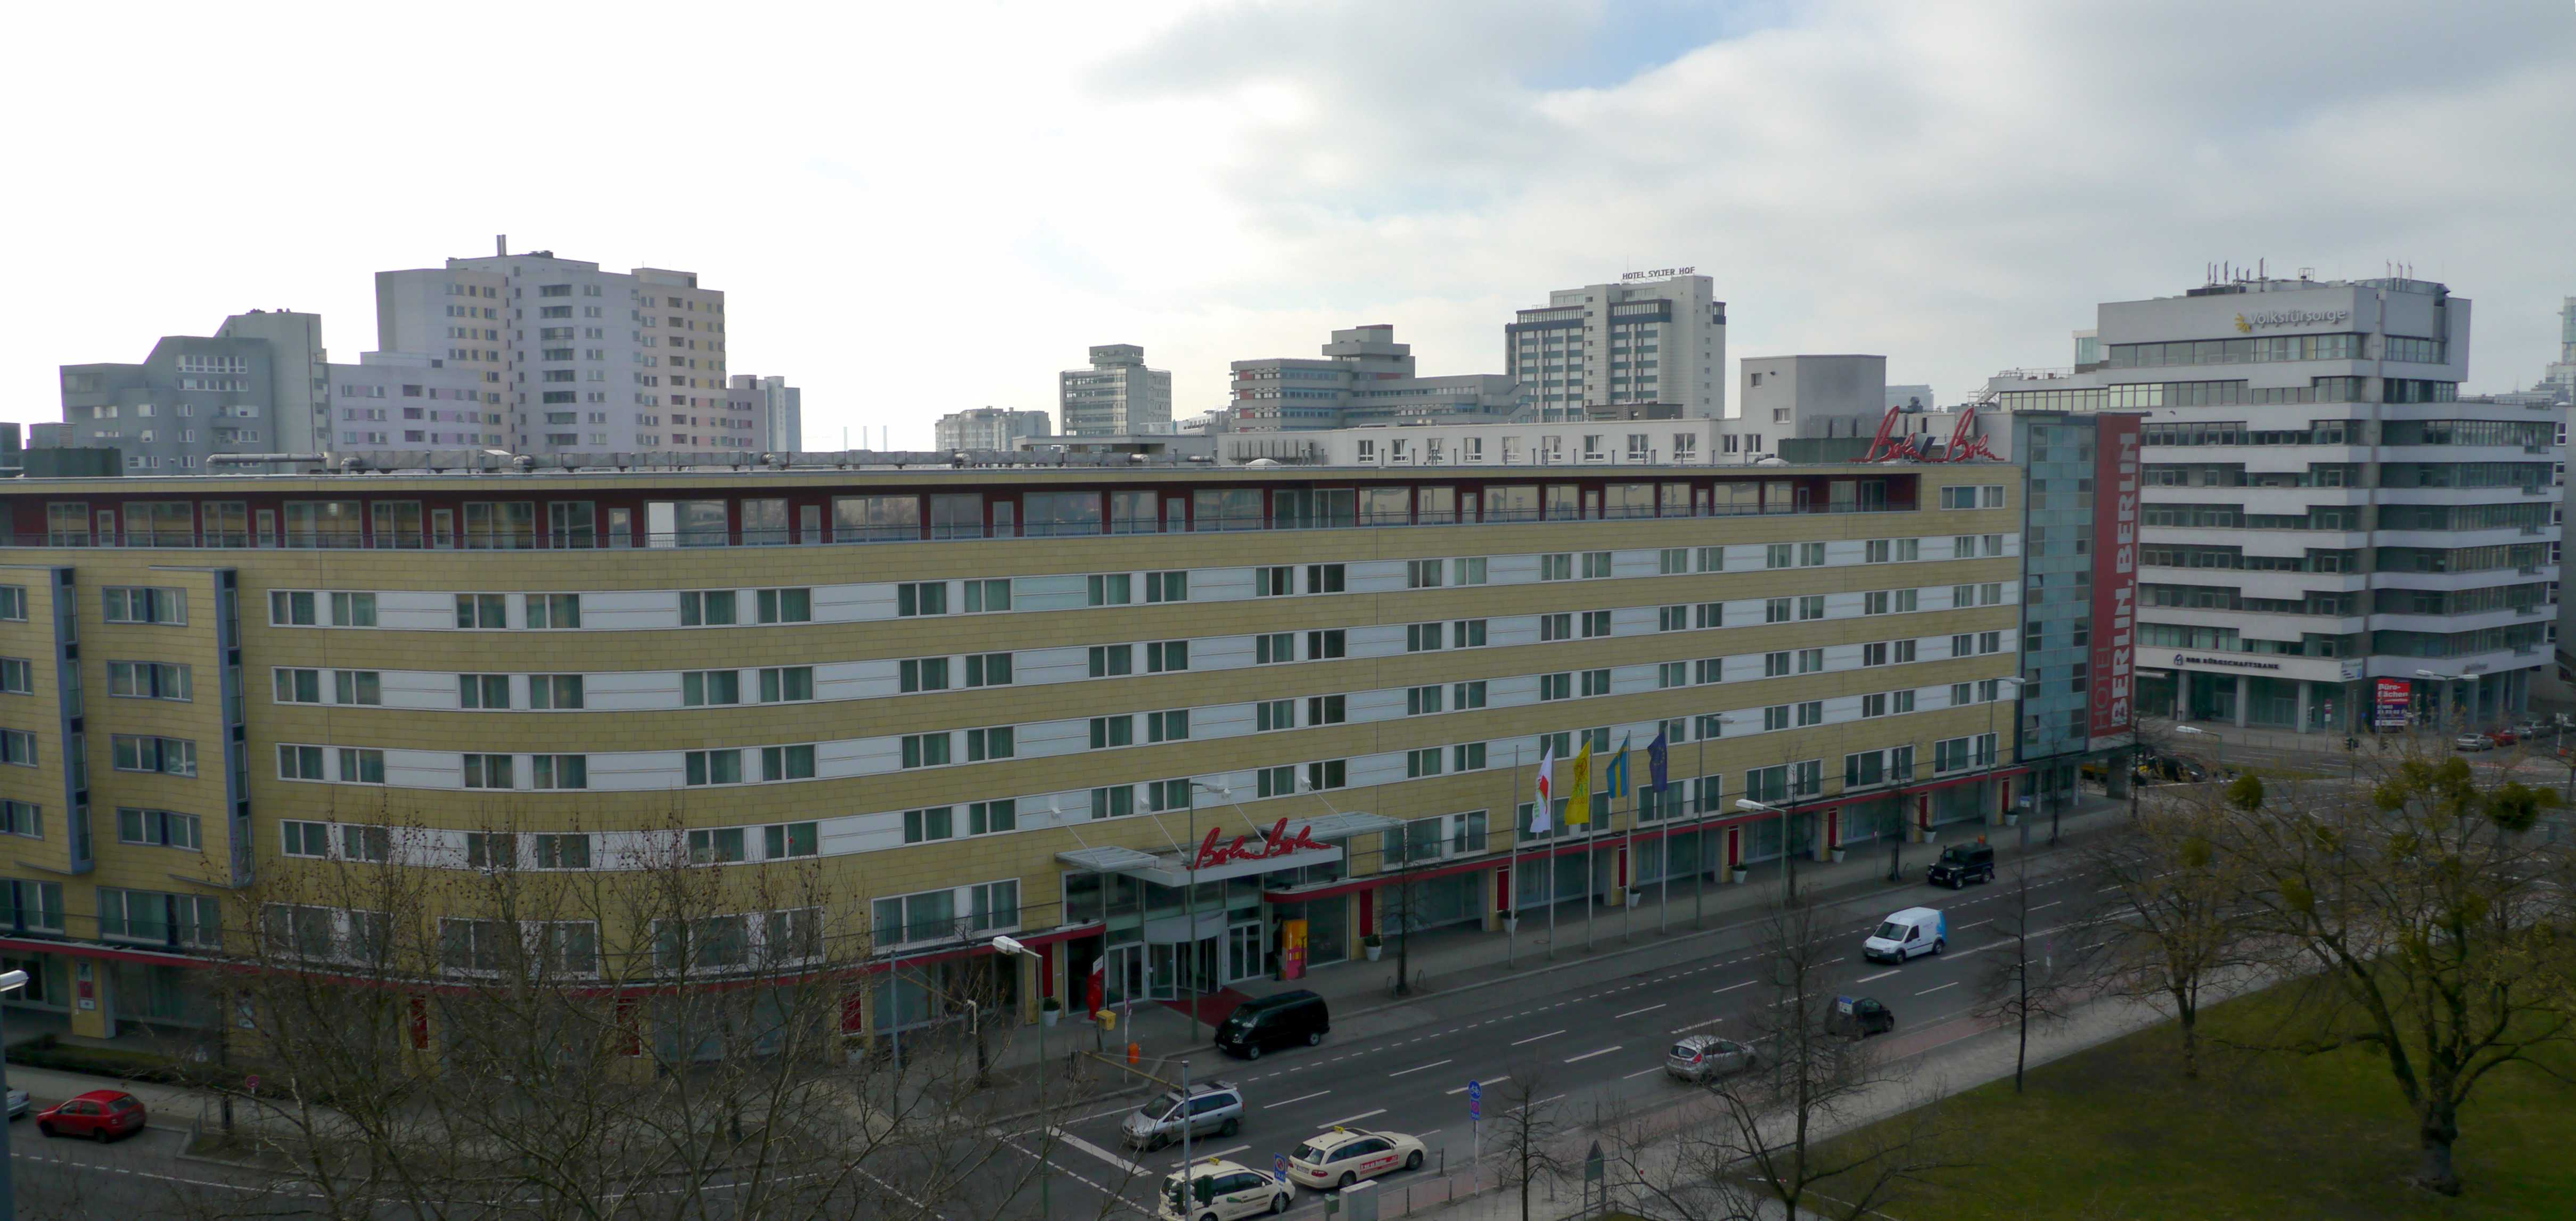 berlin casino hotel